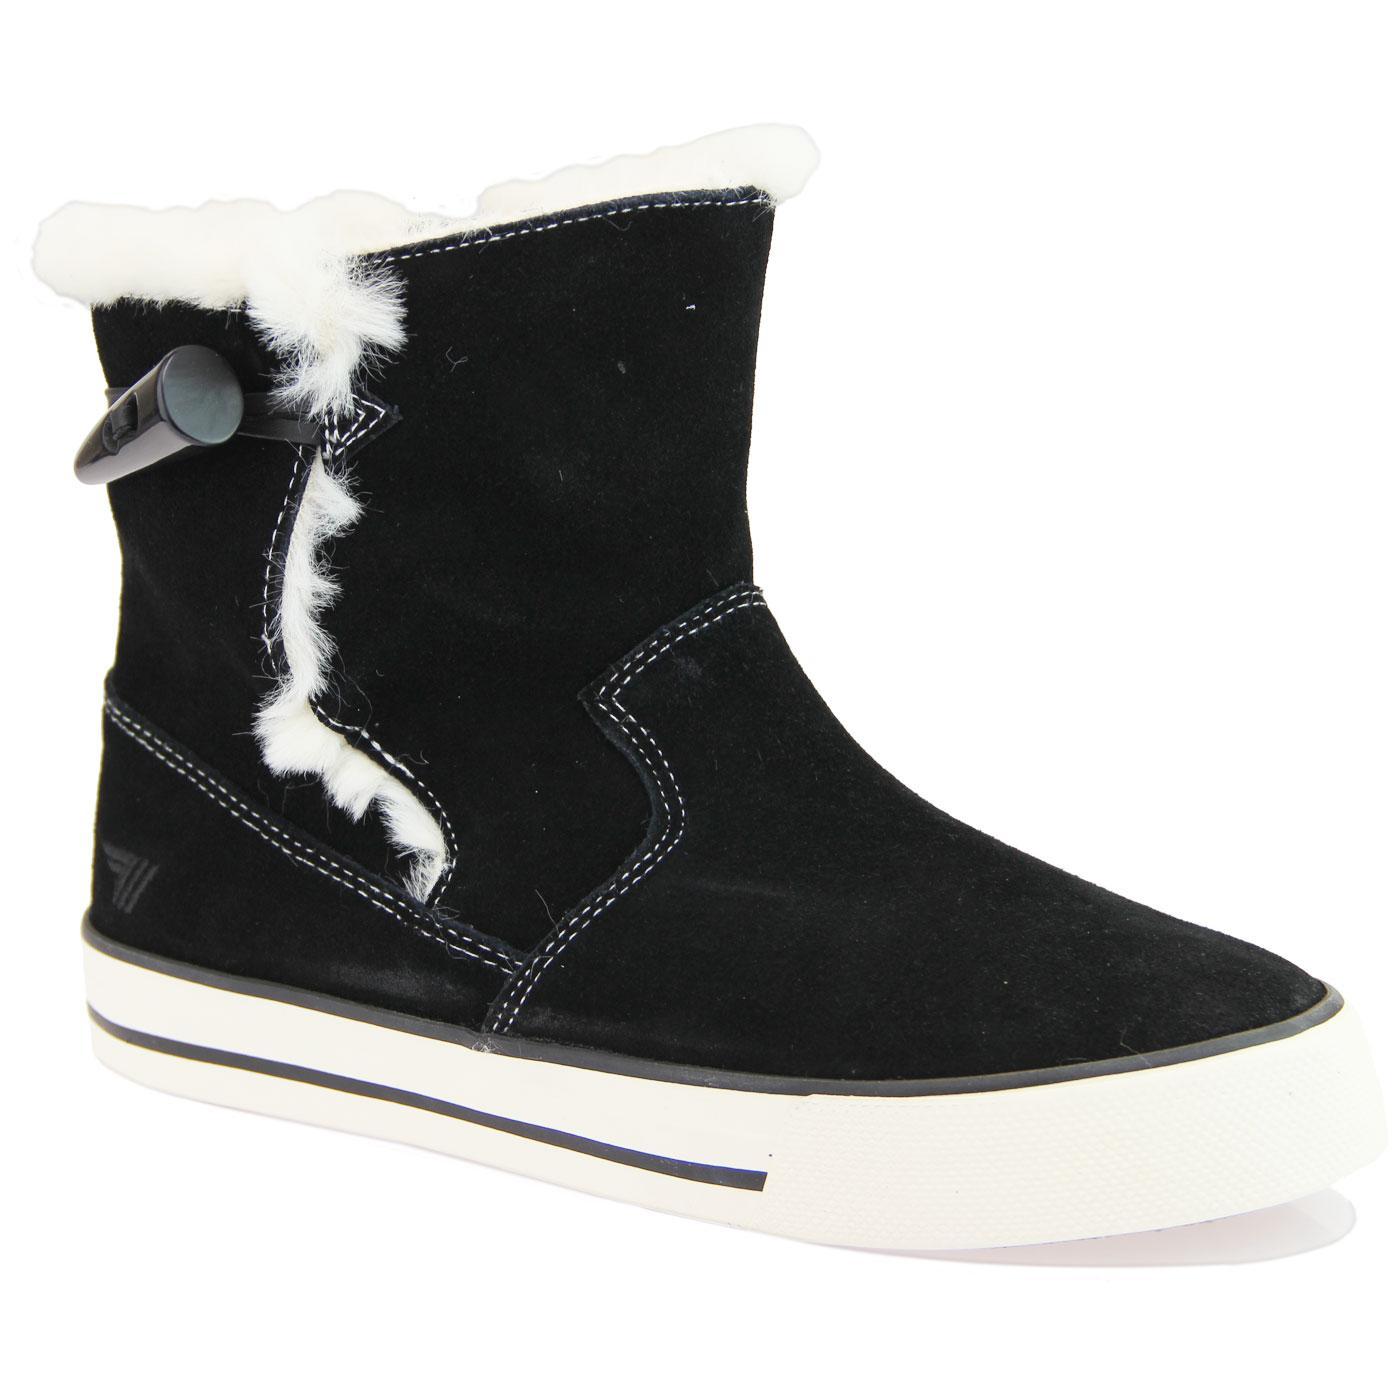 Sidewalk GOLA Retro 70s Fur Lined Trainer Boots B